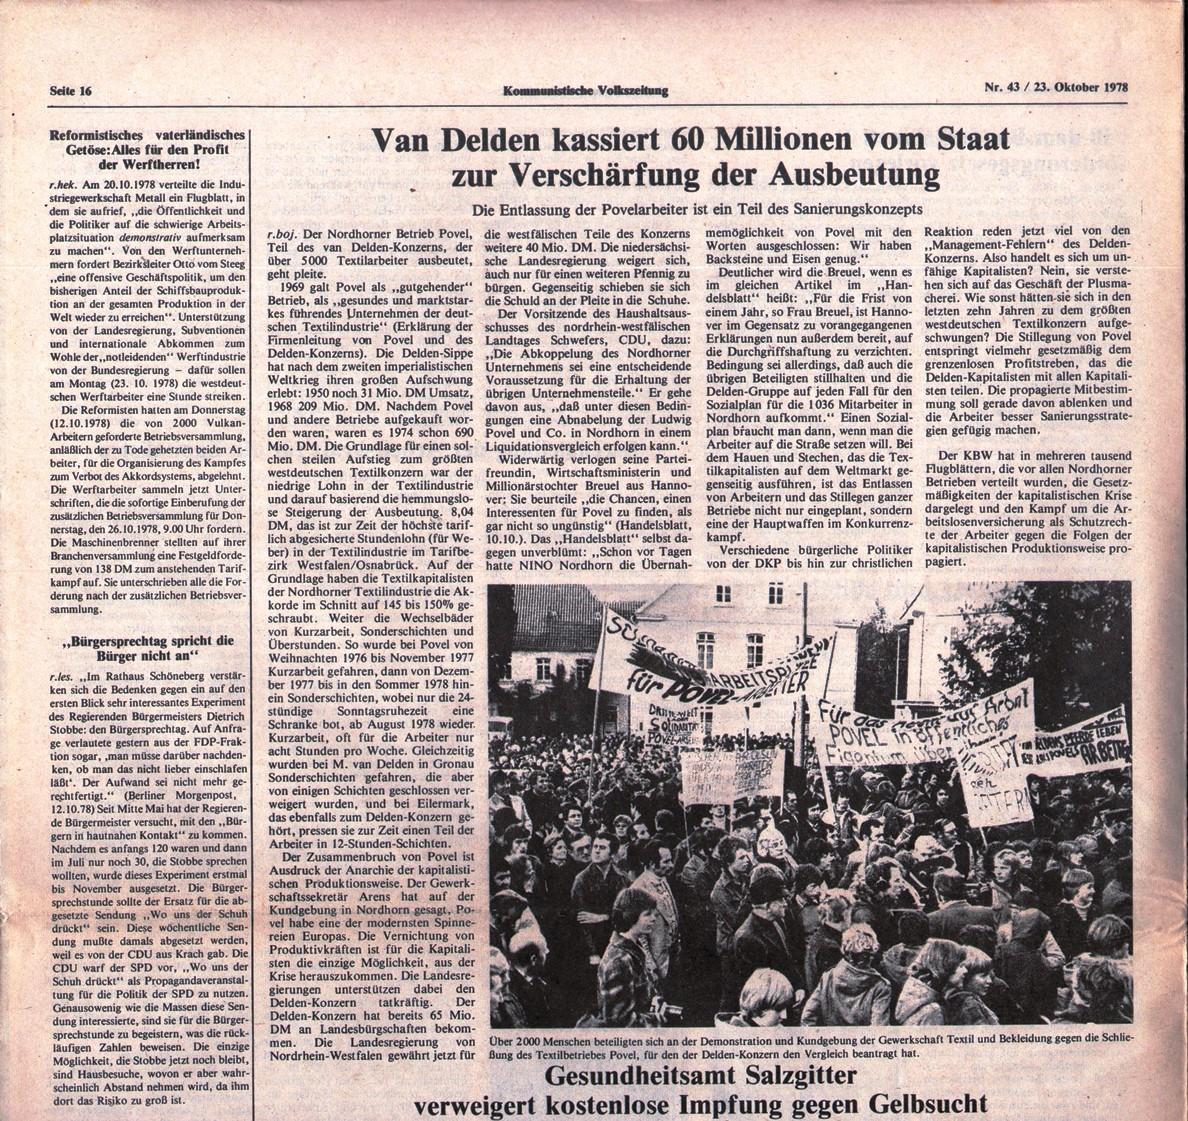 Hamburg_KVZ_1978_43_31